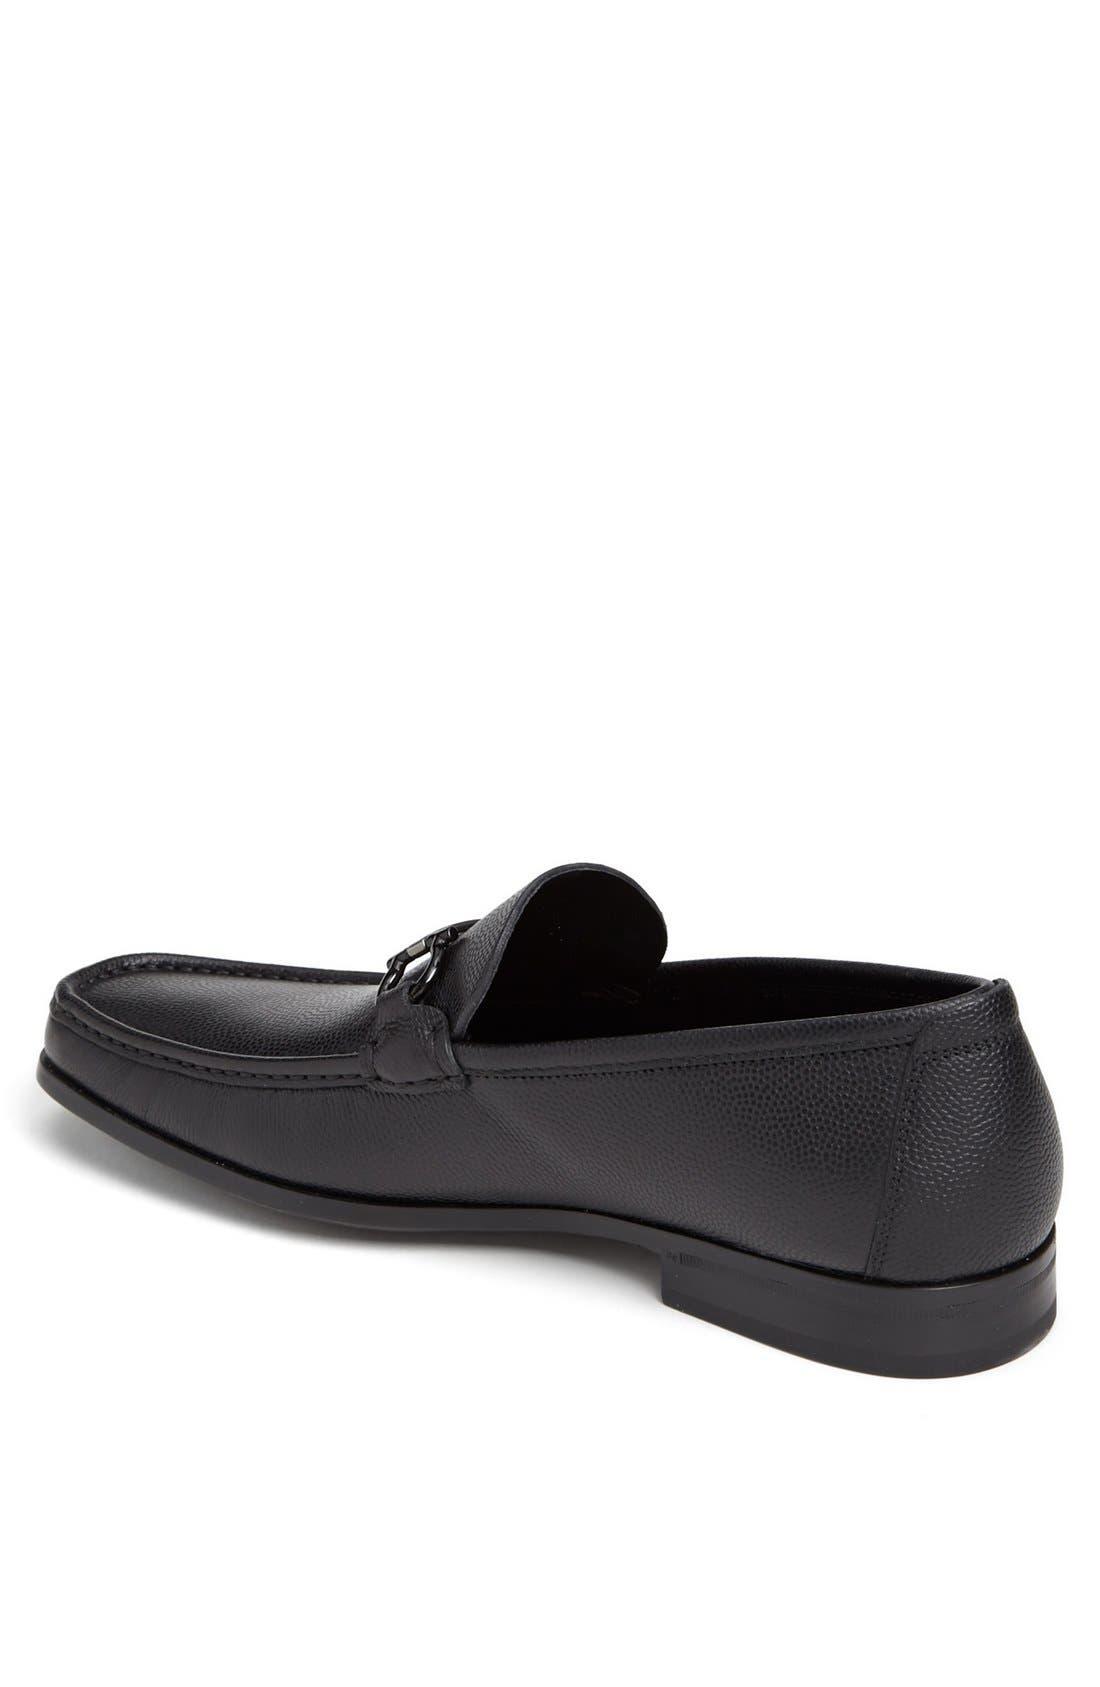 'Regal' Pebbled Leather Loafer,                             Alternate thumbnail 2, color,                             001